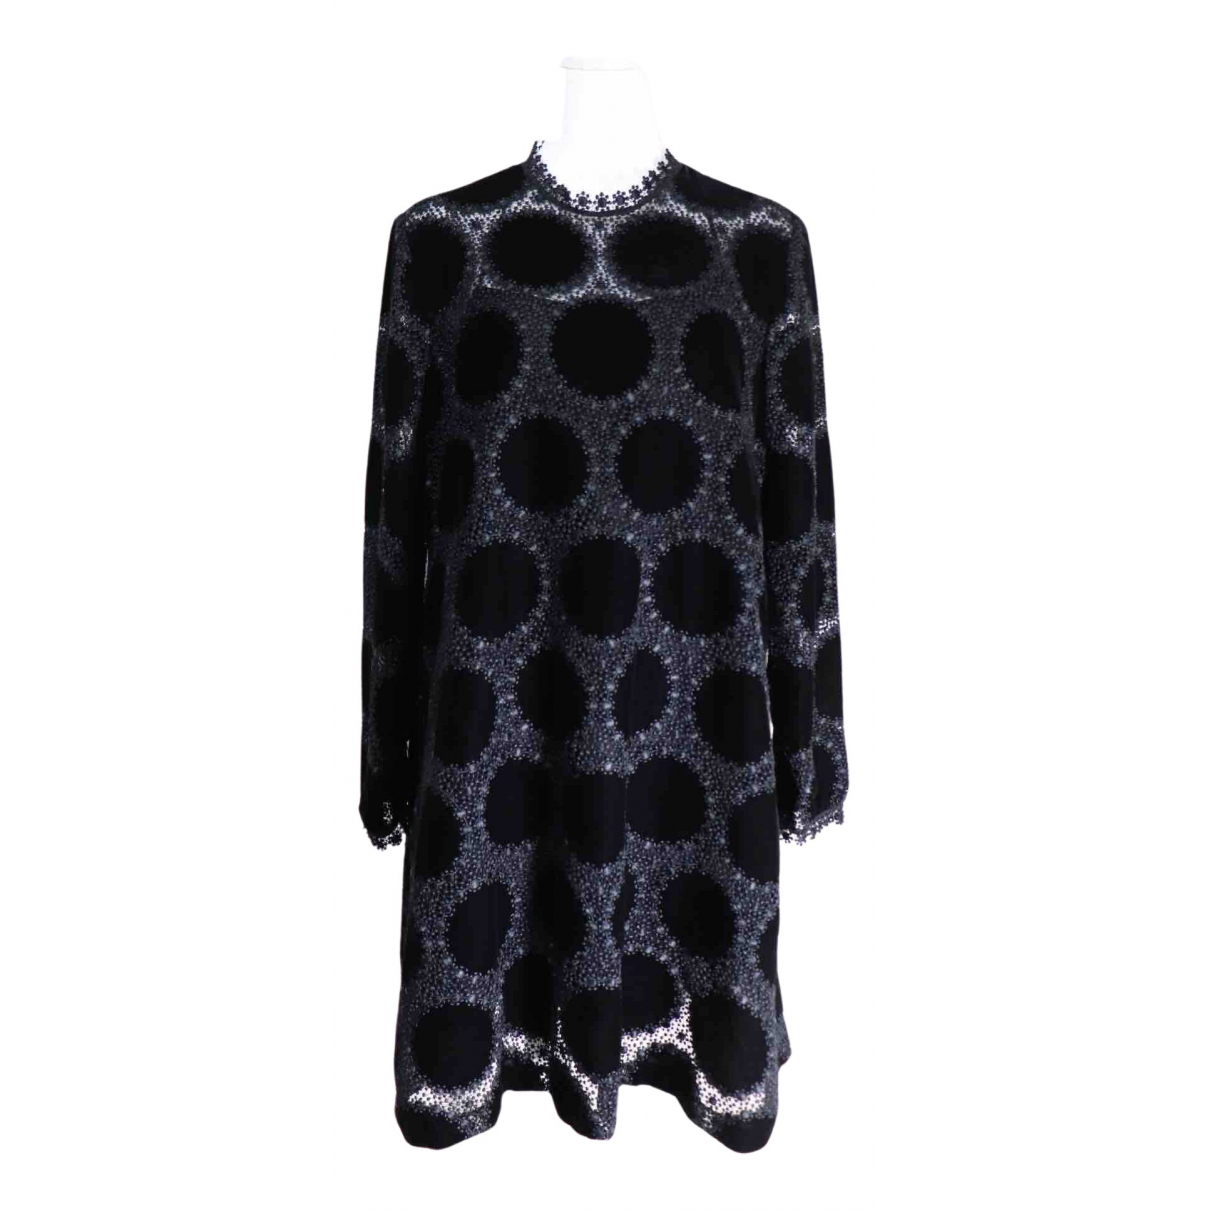 Dior \N Kleid in  Schwarz Synthetik